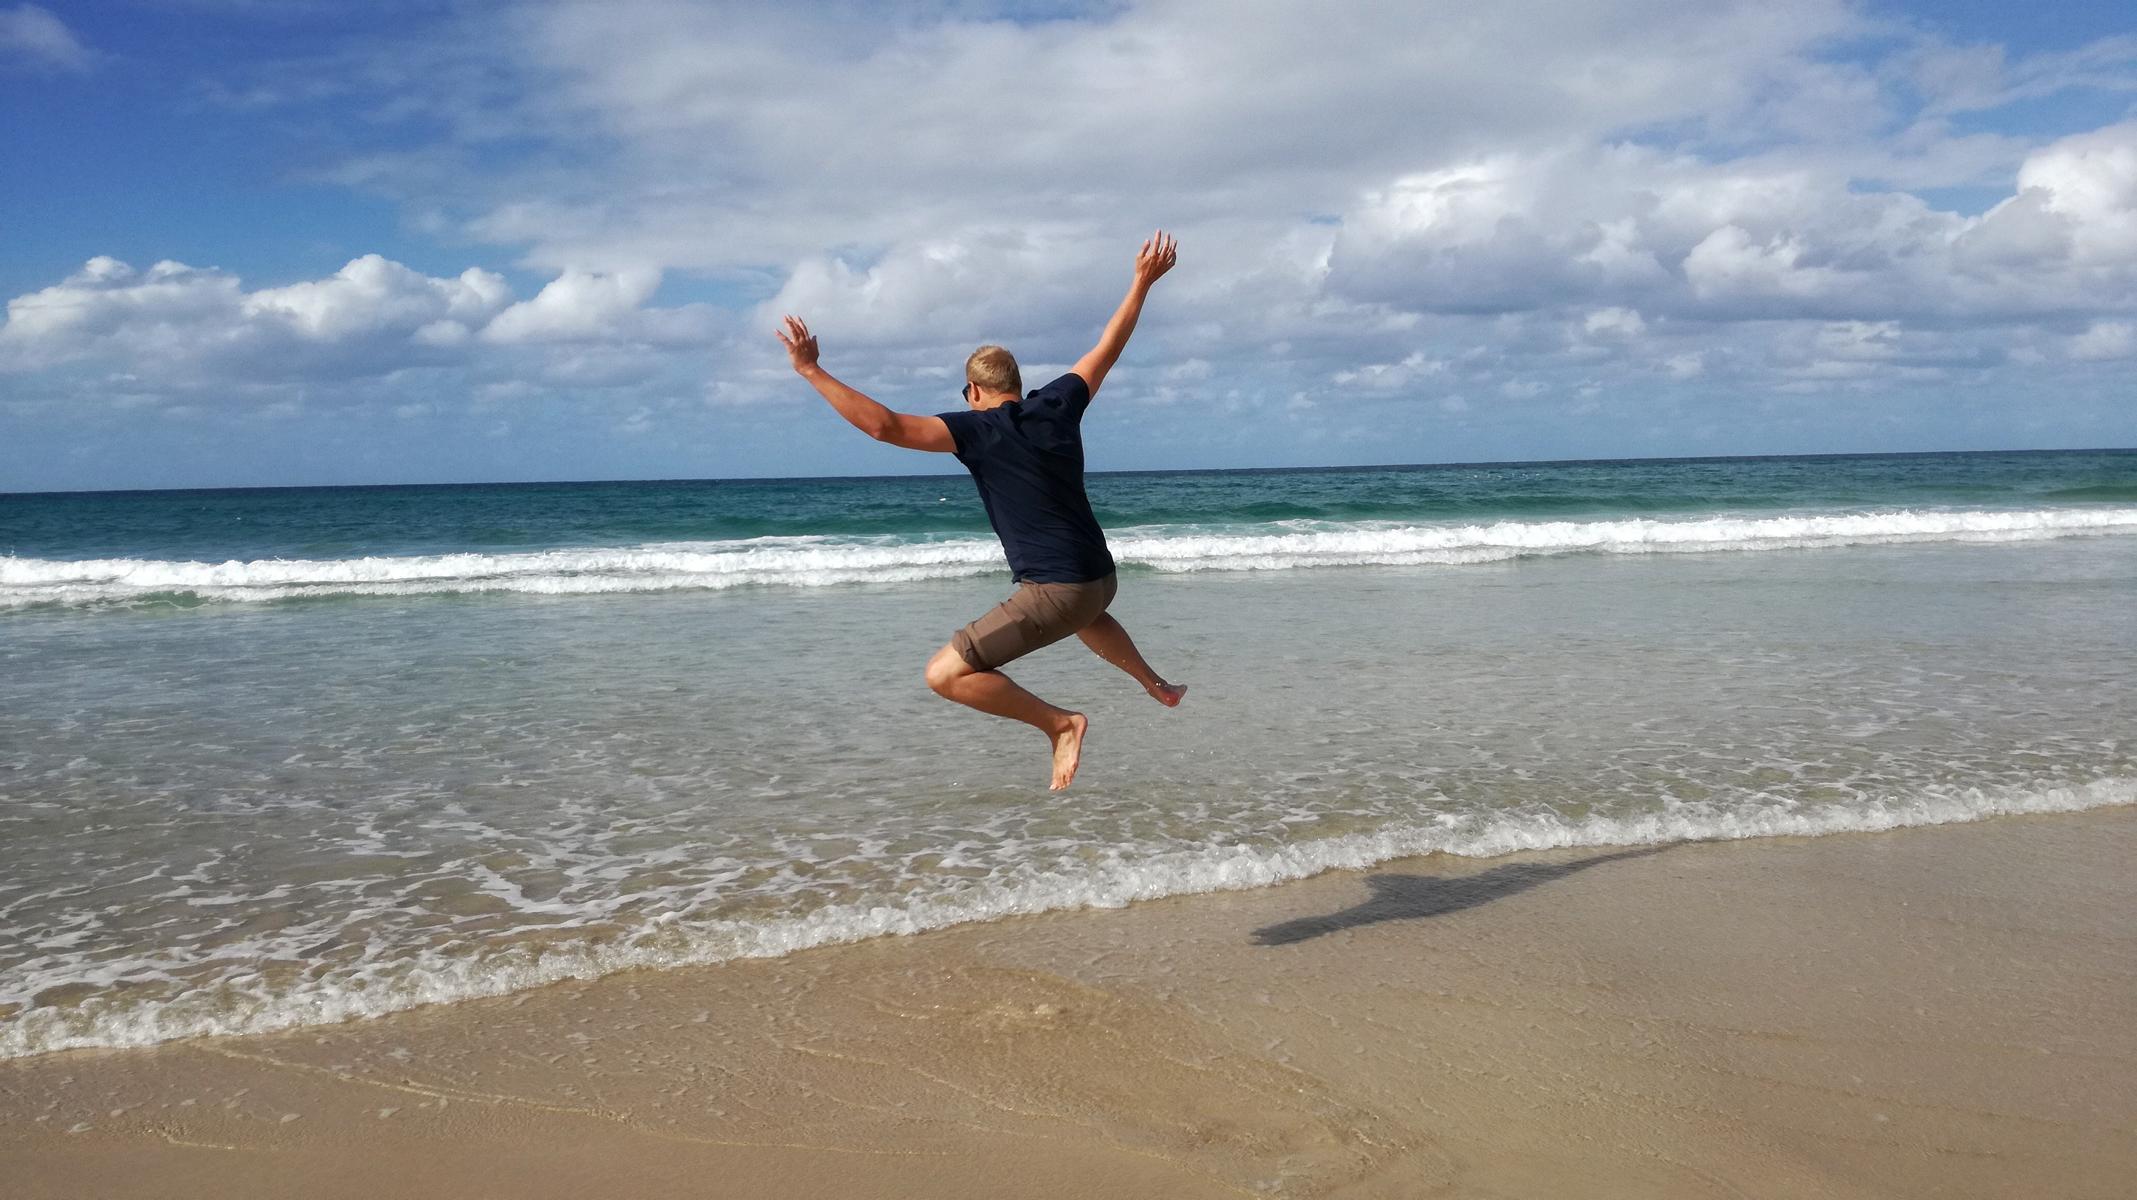 waiheke-island-neuseeland-tipps-highlights-reise-backpacking